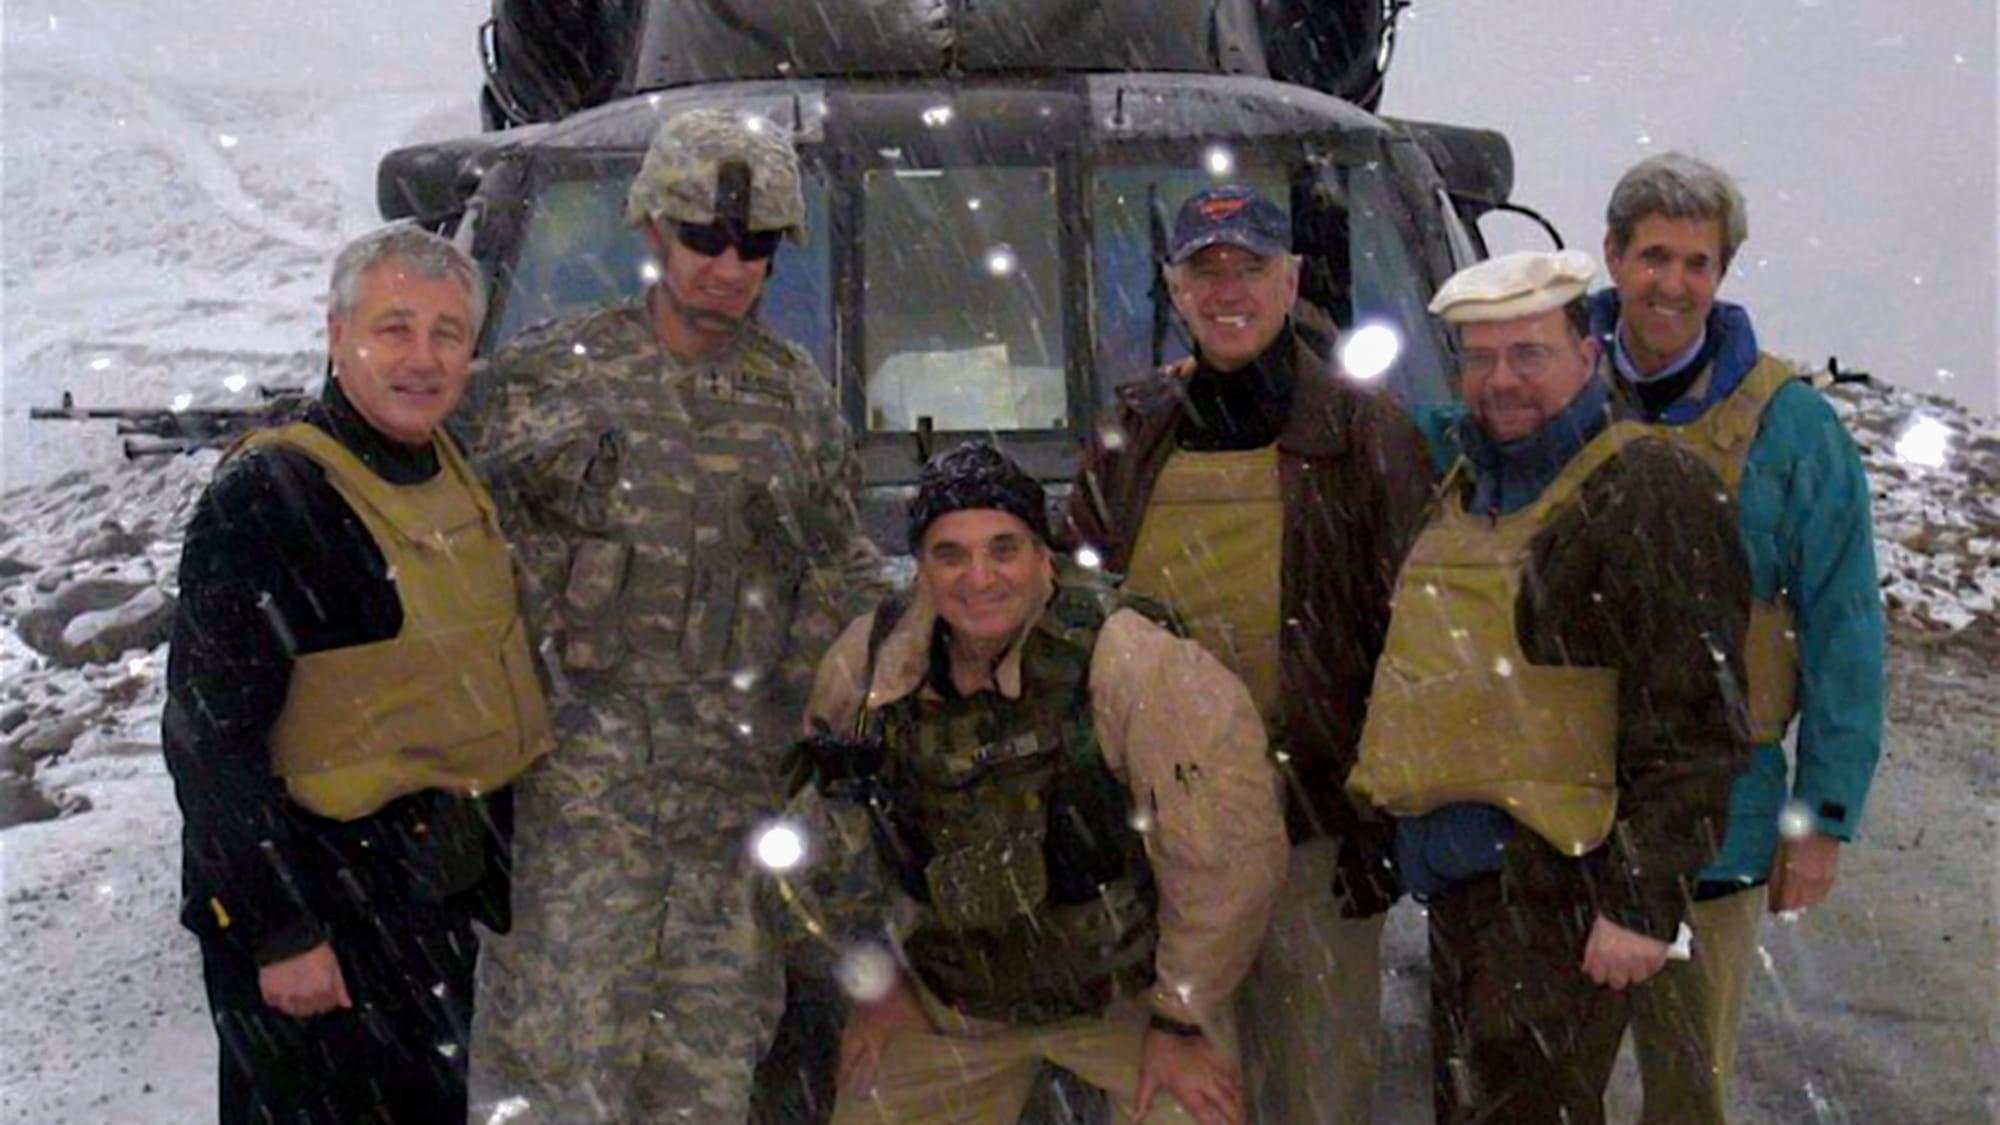 President Biden Afghanistan Storm Helicopter Photo Op